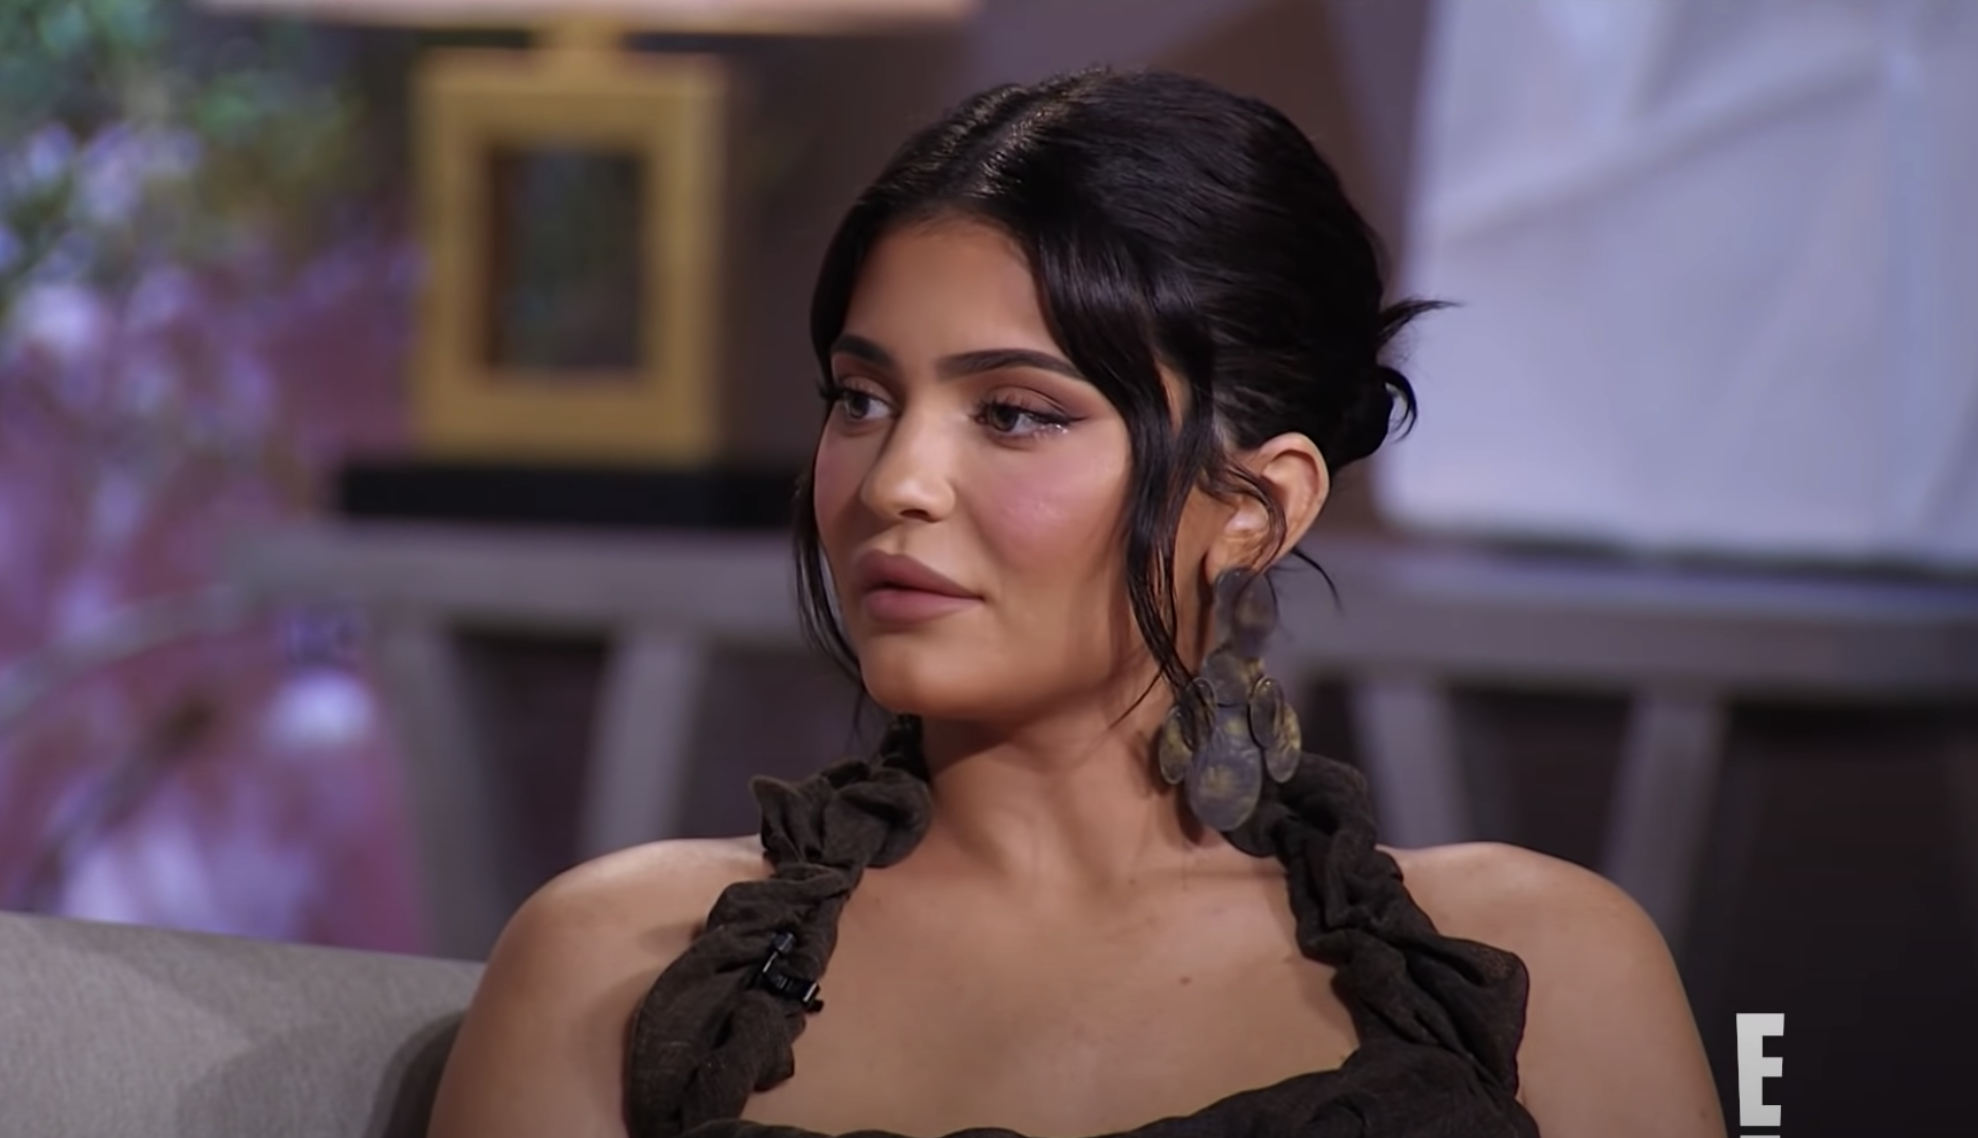 Challenge kylie jenner nipple Kylie Jenner